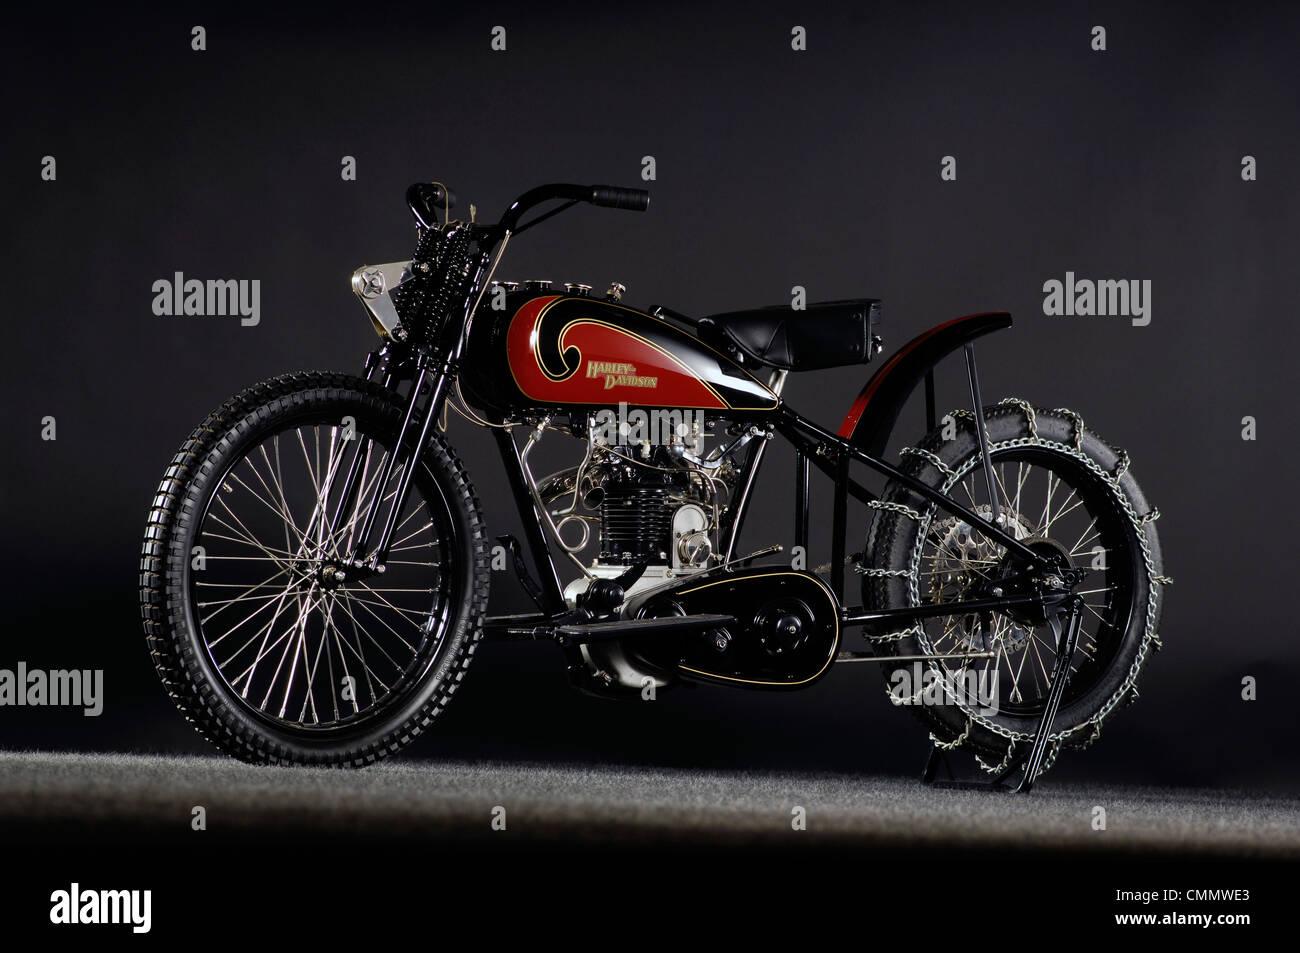 1930 Harley Davidson OHV Peashooter - Stock Image